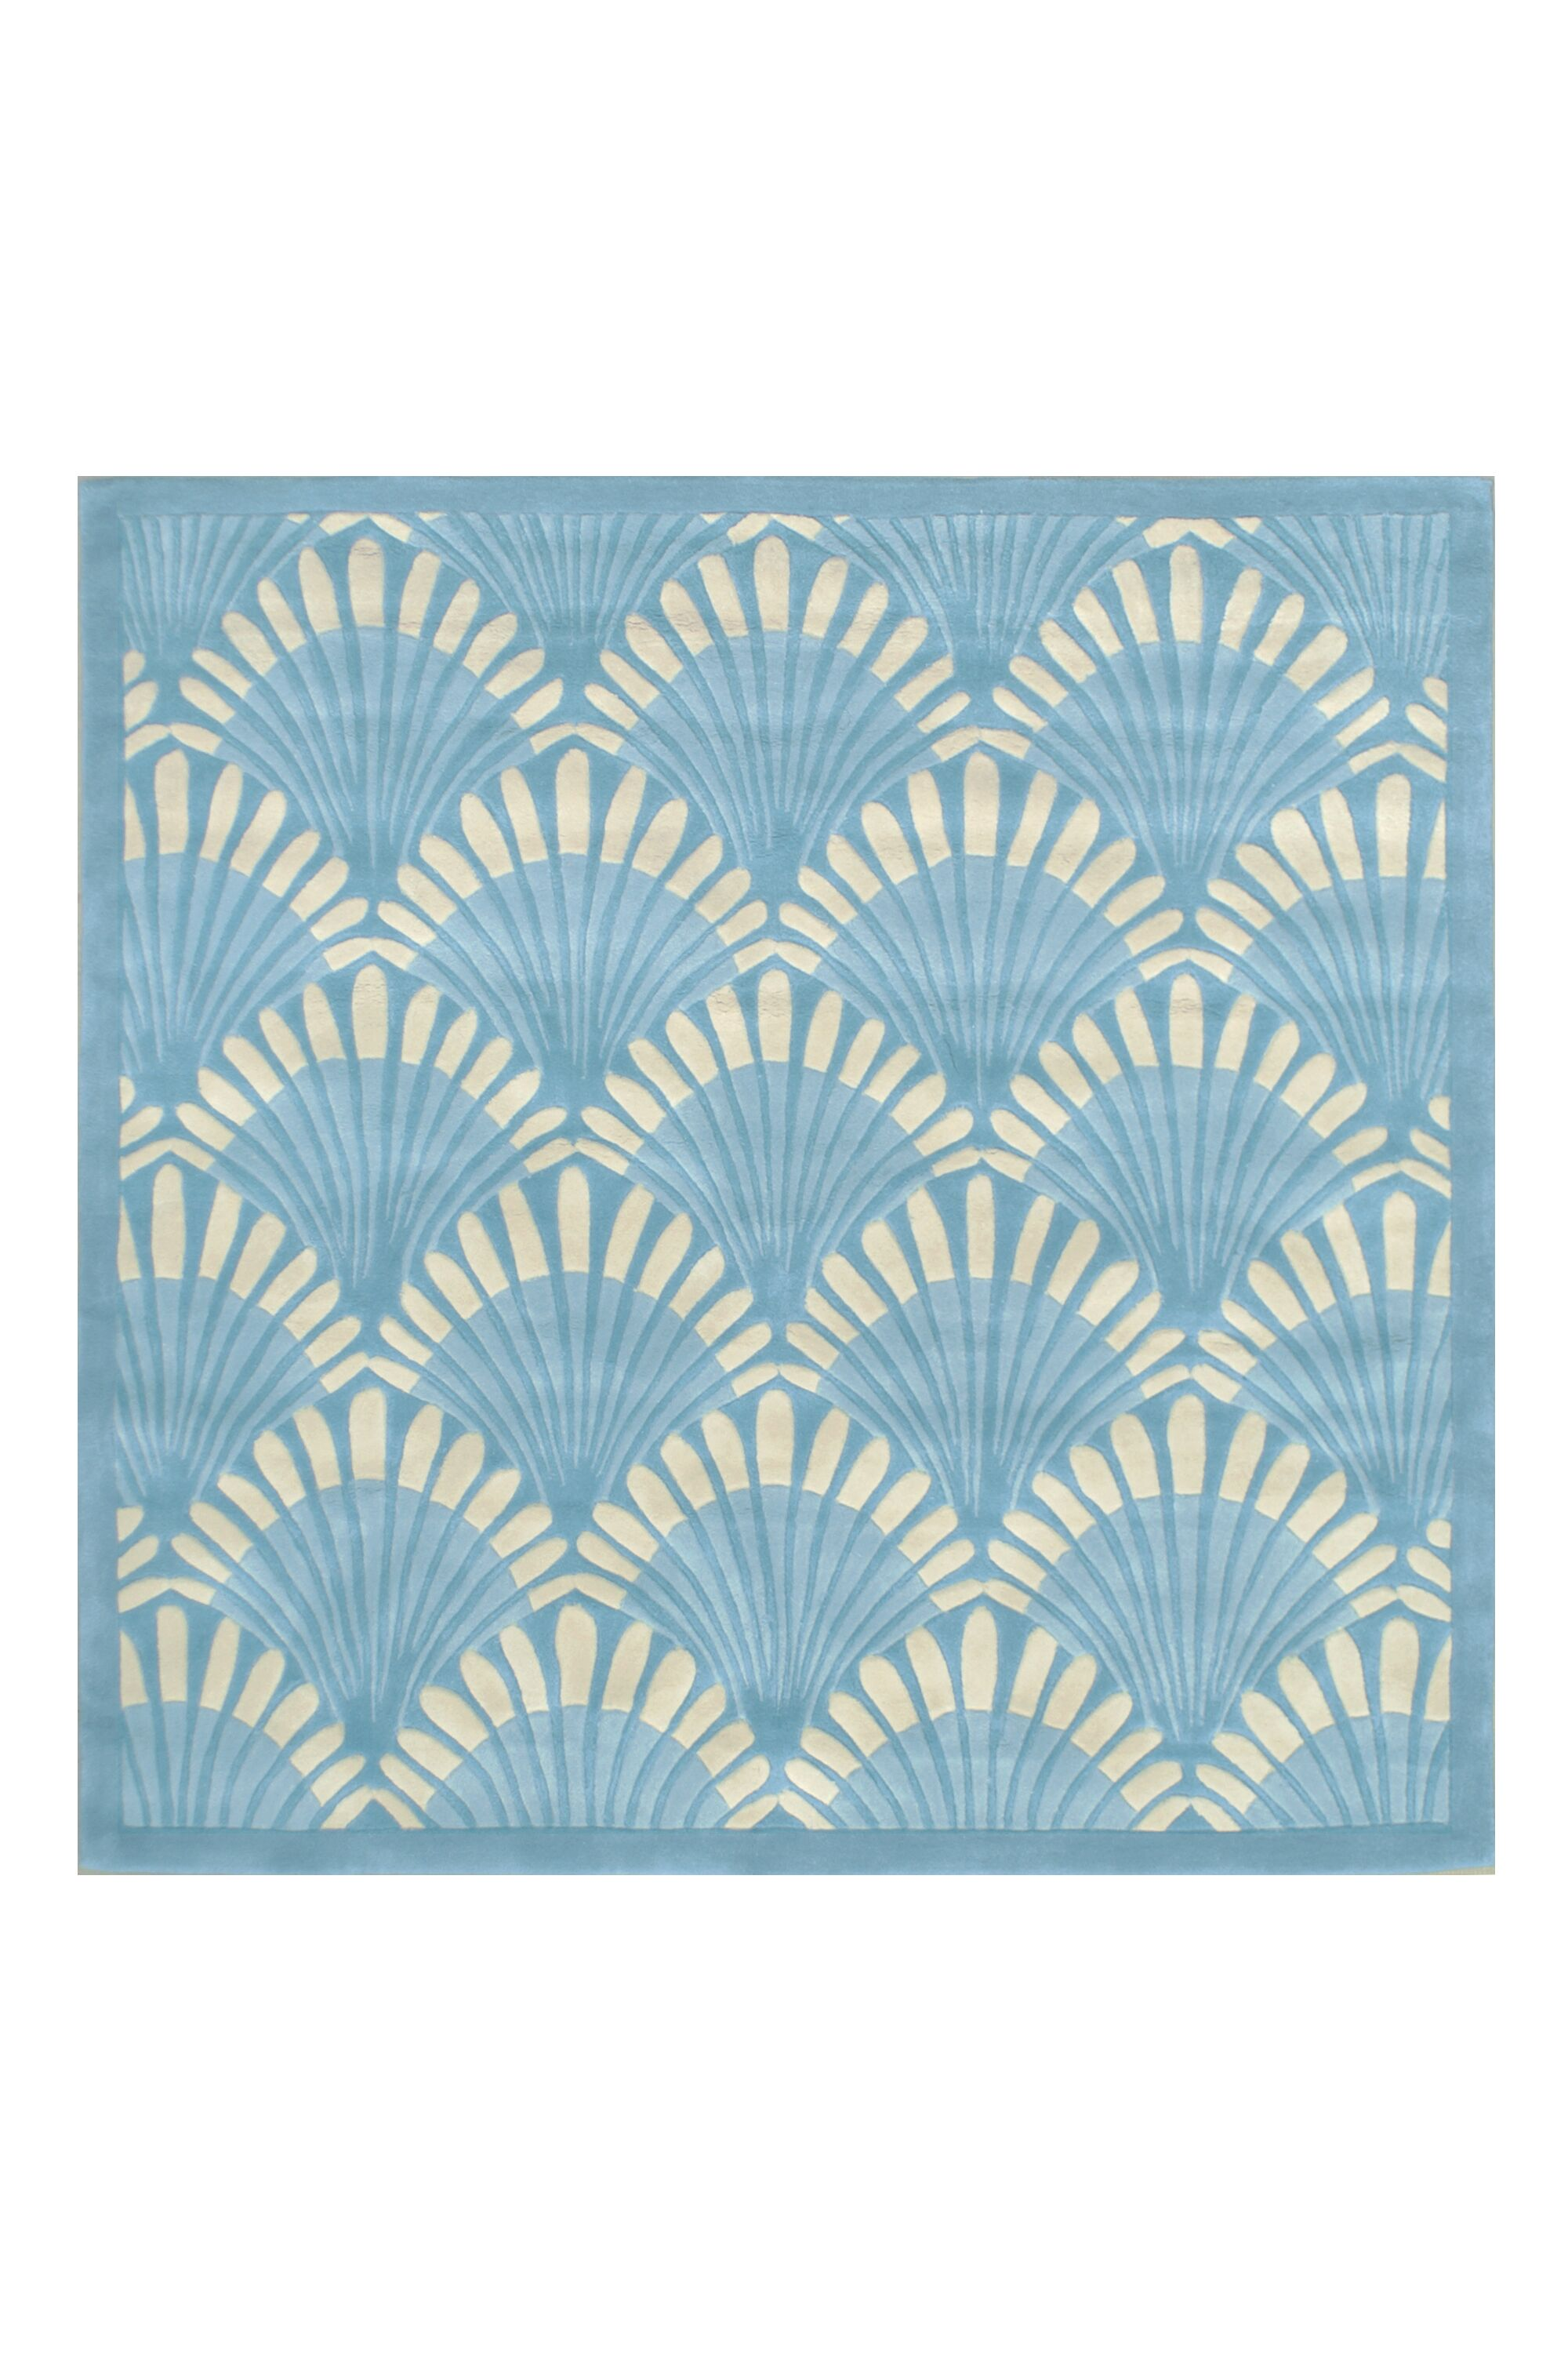 Aalin Hand-Tufted Blue Area Rug